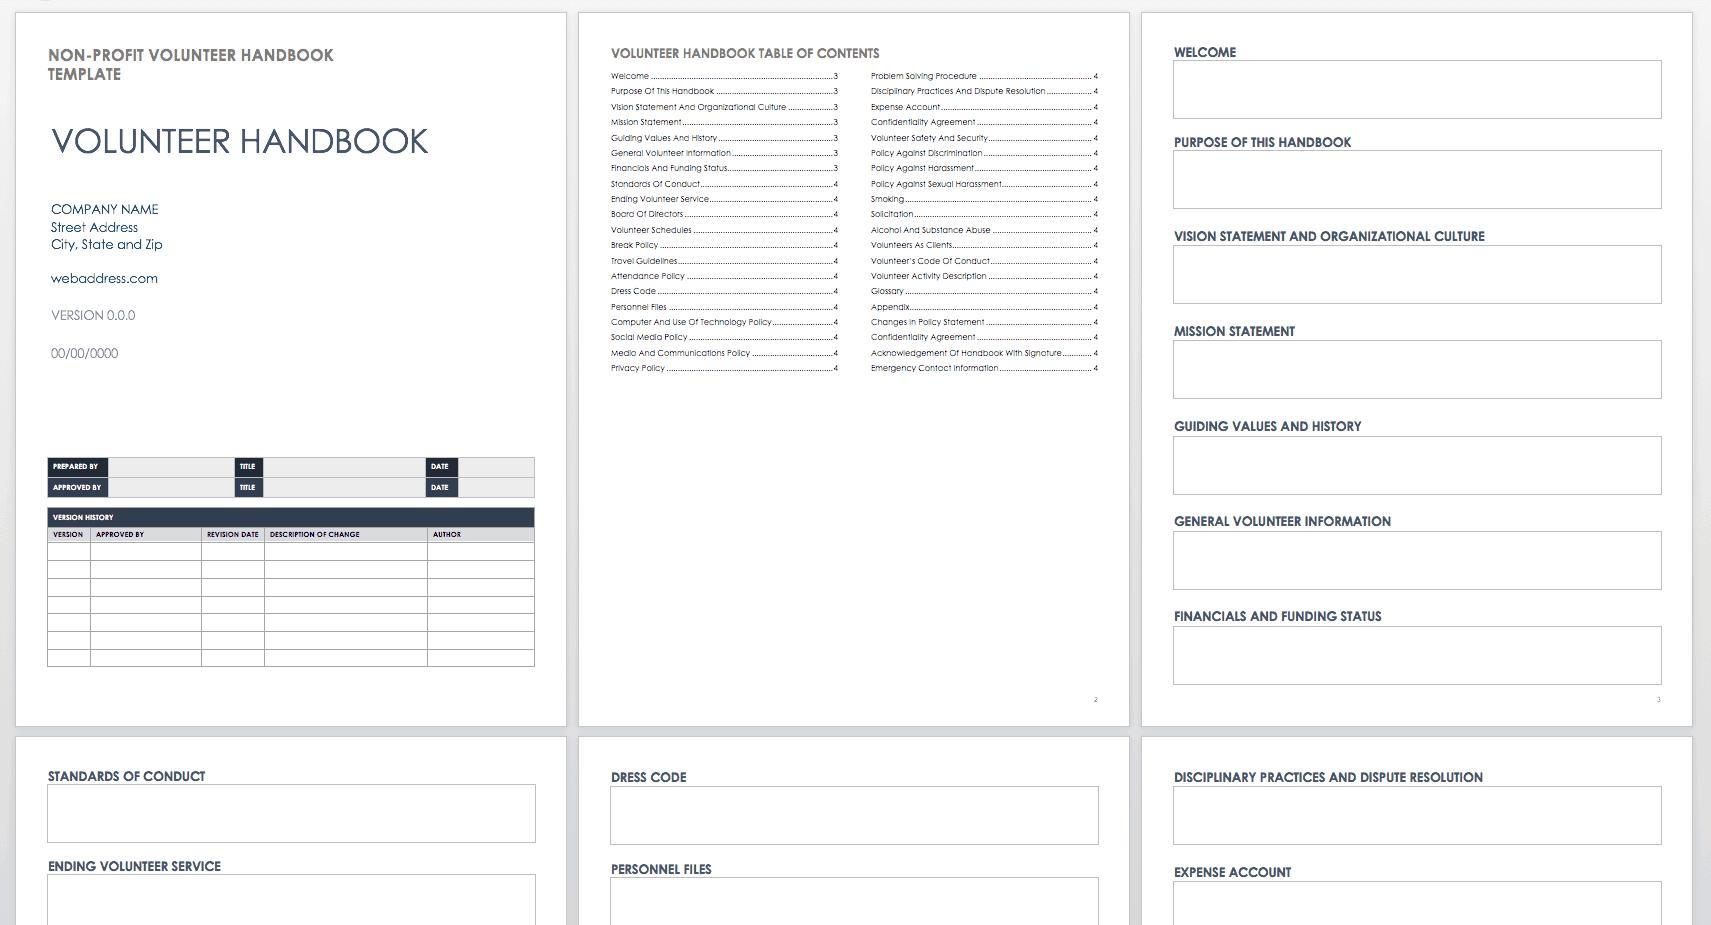 Employee and Company Handbook Templates | Smartsheet